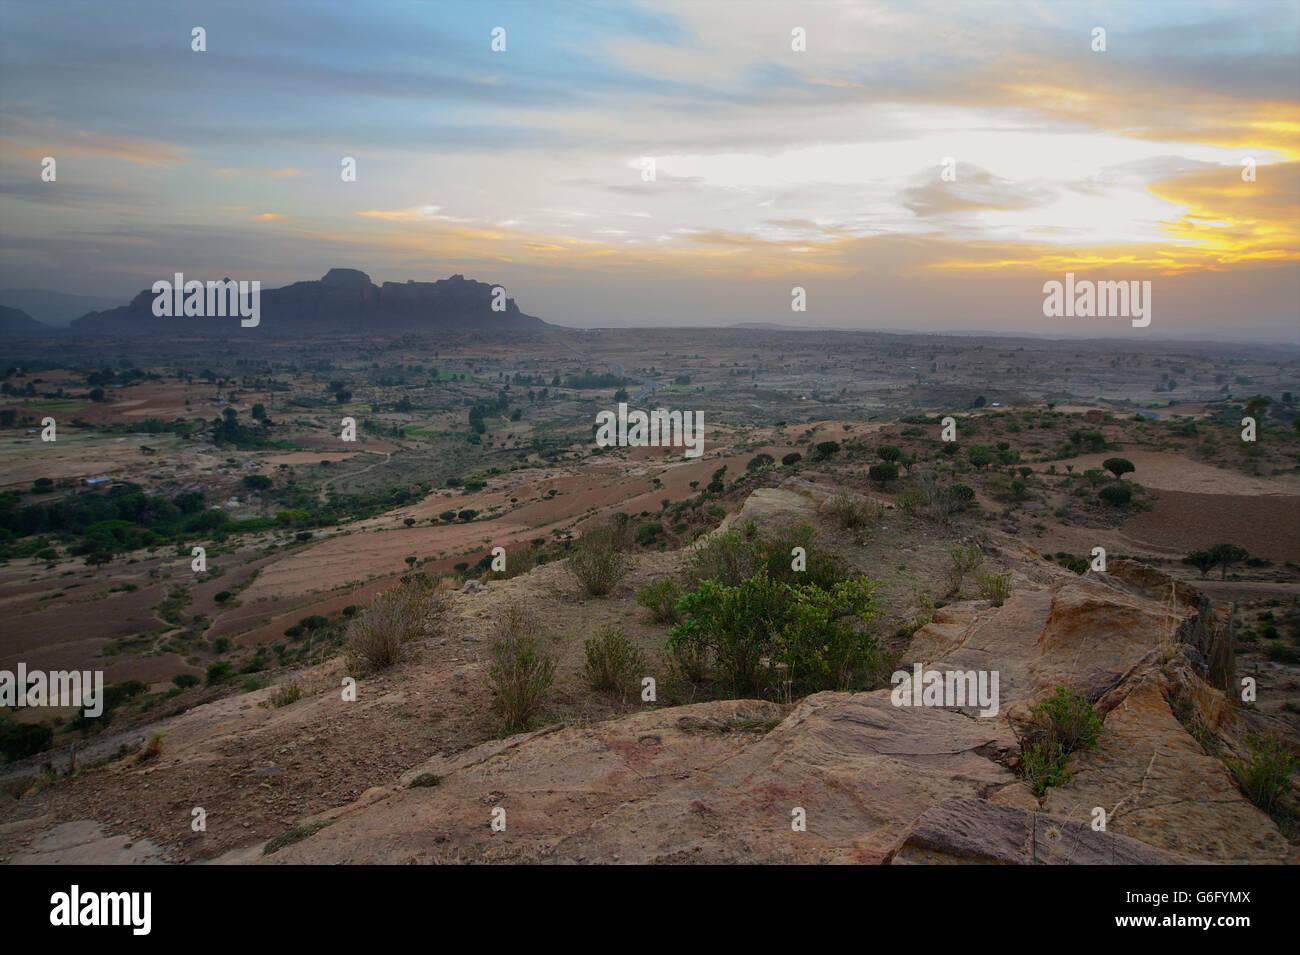 Gheralta mountains seen from the Gheralta lodge, near Hawzen, Tigray, Ethiopia - Stock Image